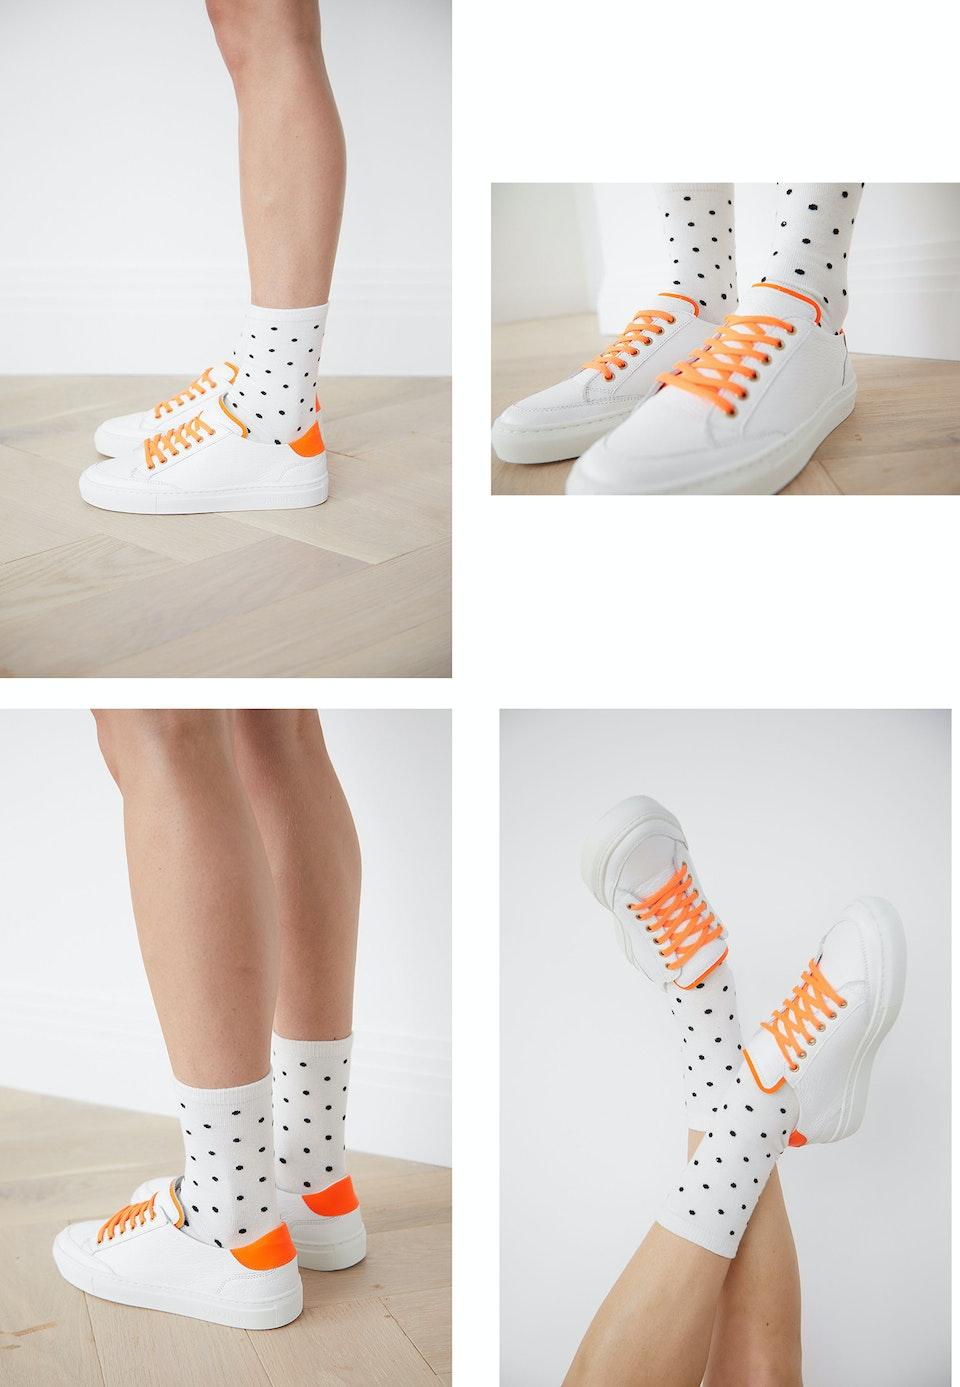 TaschkaShoes_001 -